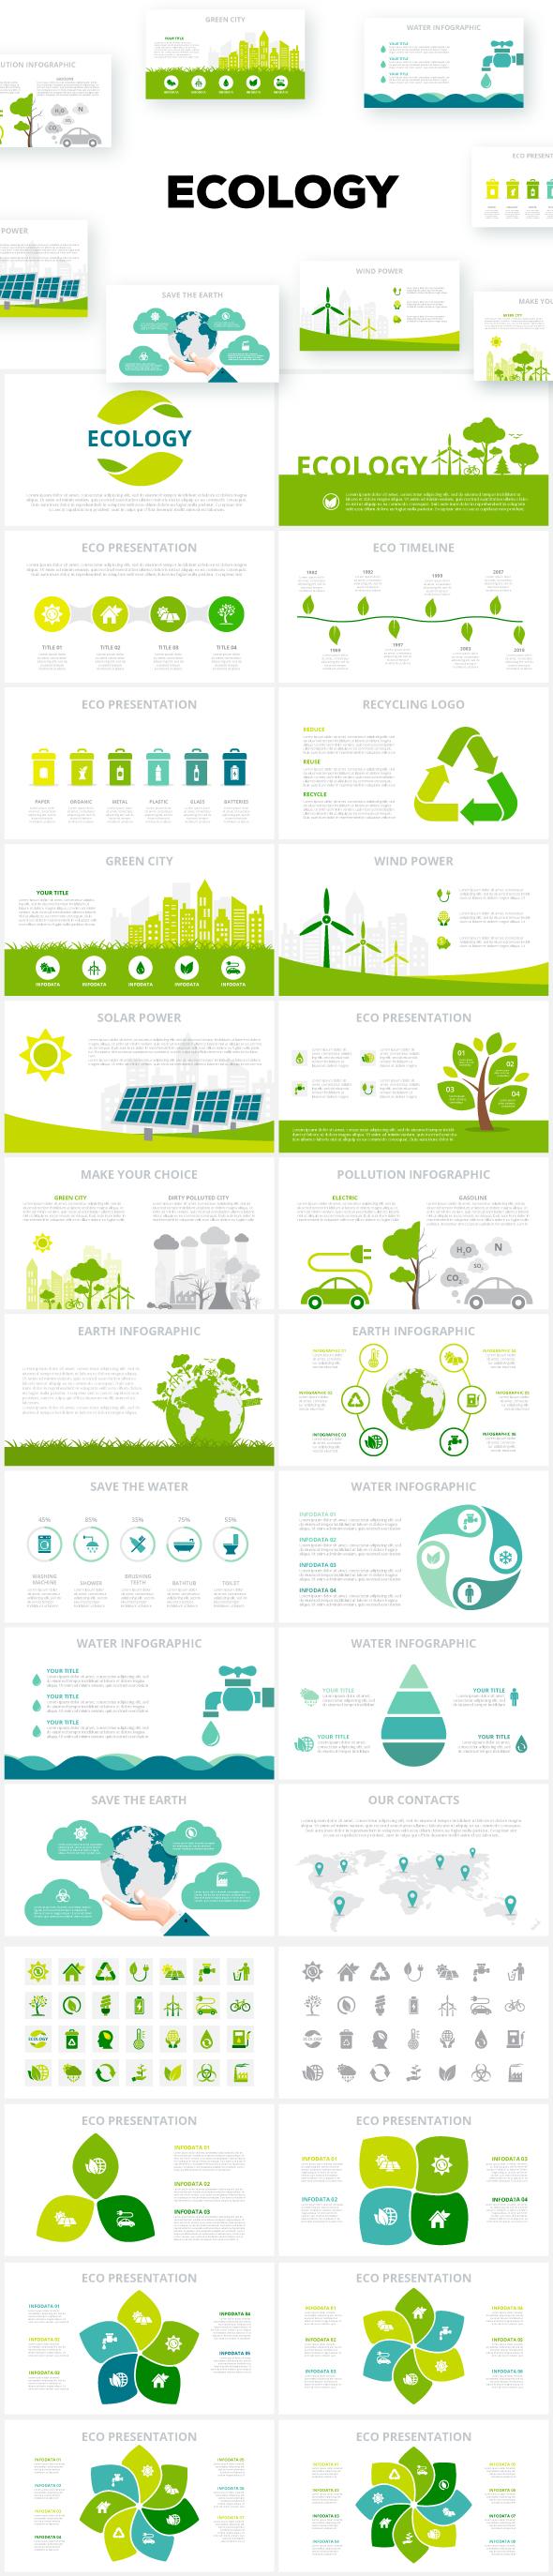 Multipurpose Infographics PowerPoint Templates v.5.0 - 171